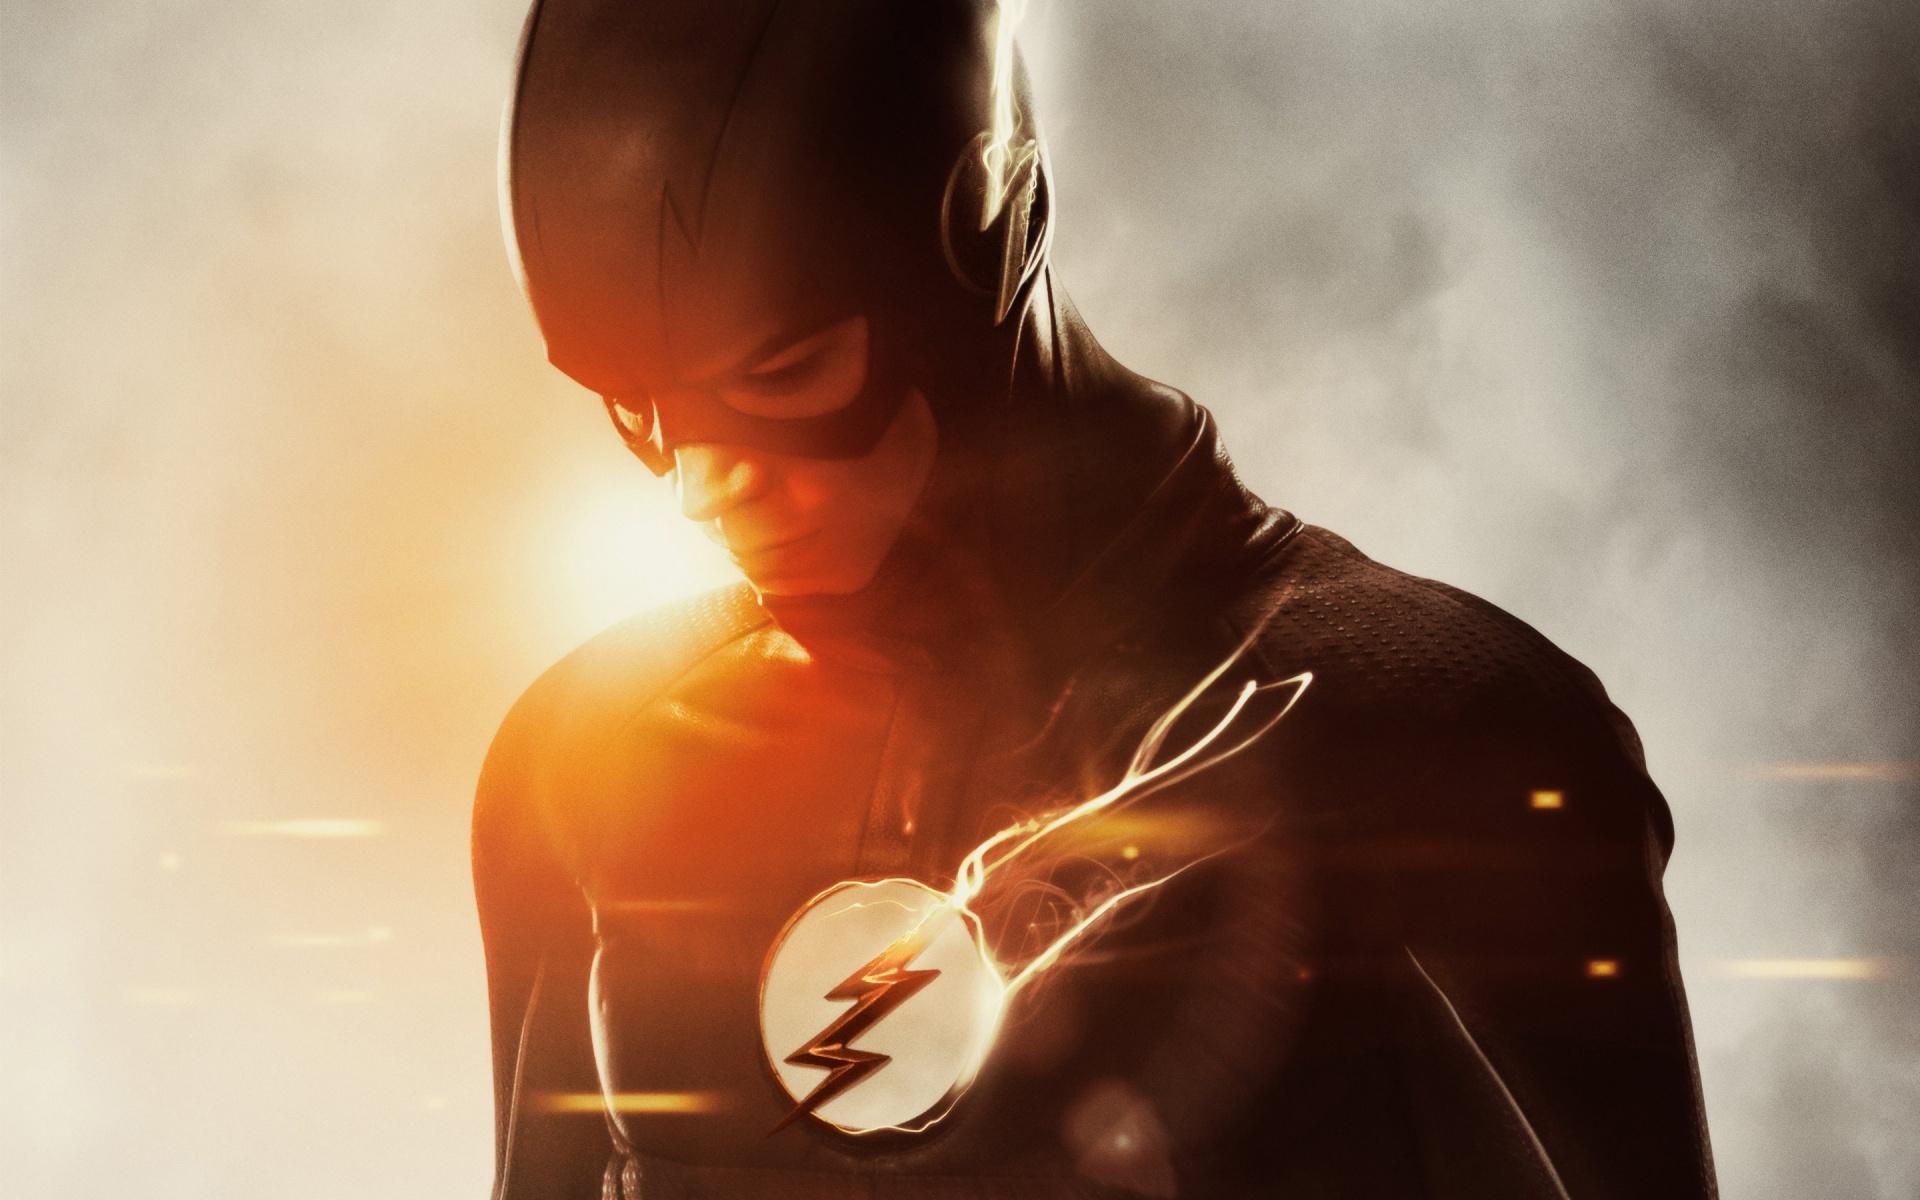 The Flash Season 2 Wallpapers